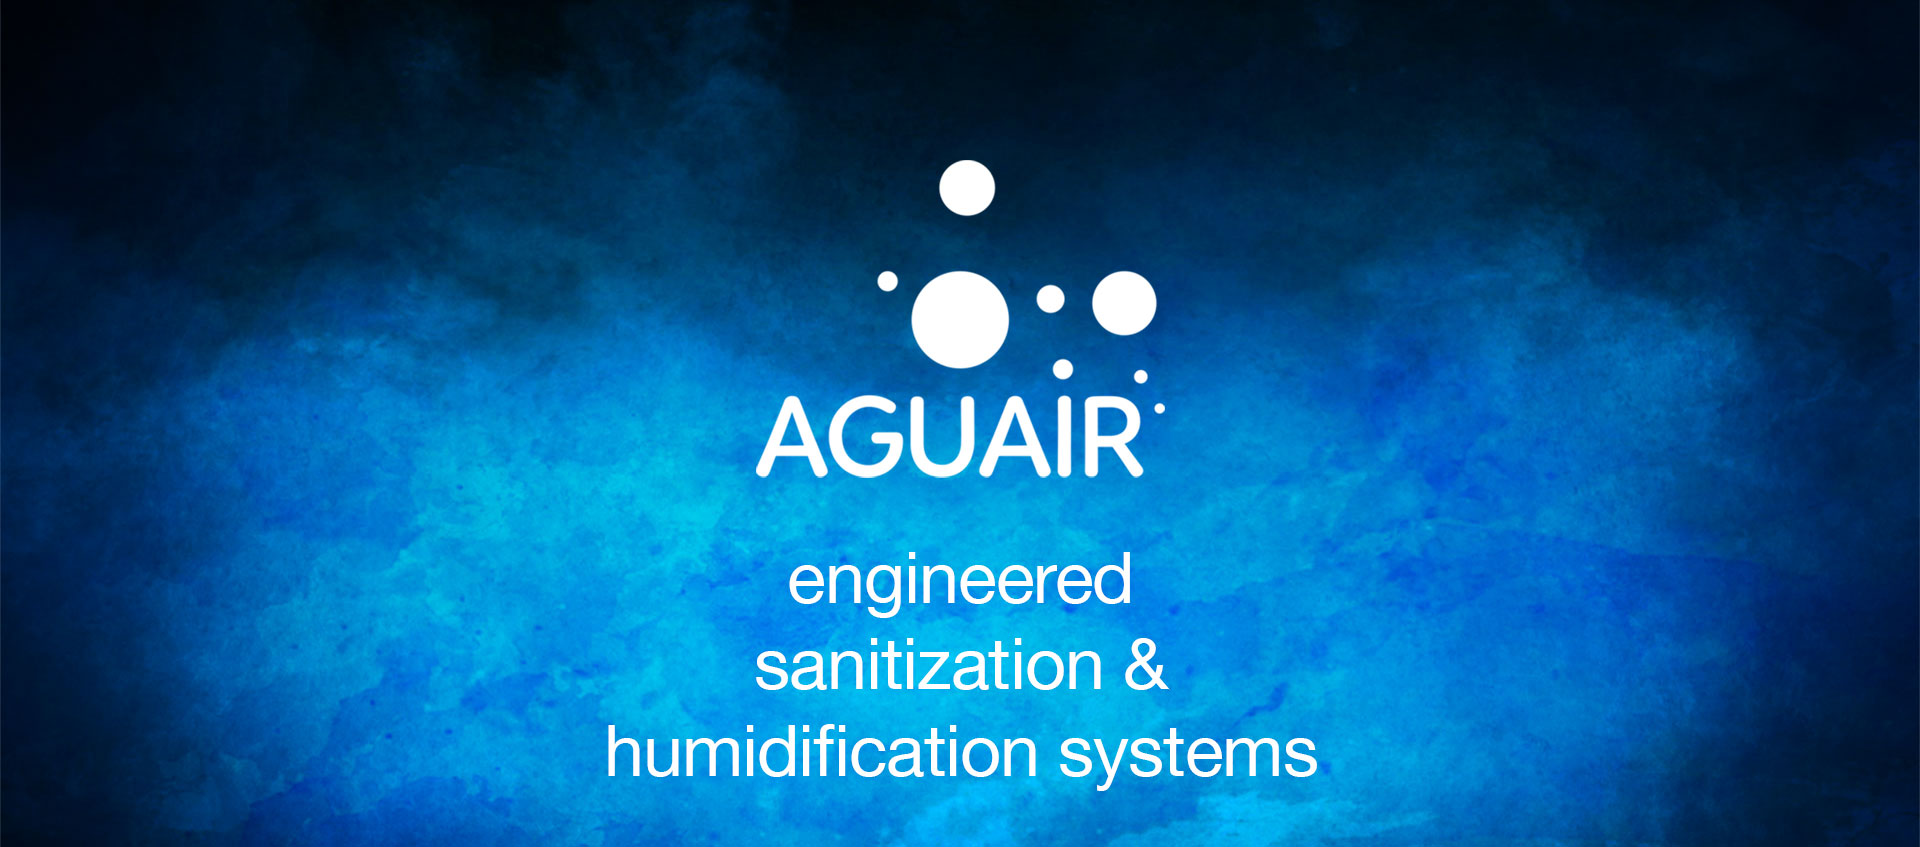 Aguair Engineered Sanitization